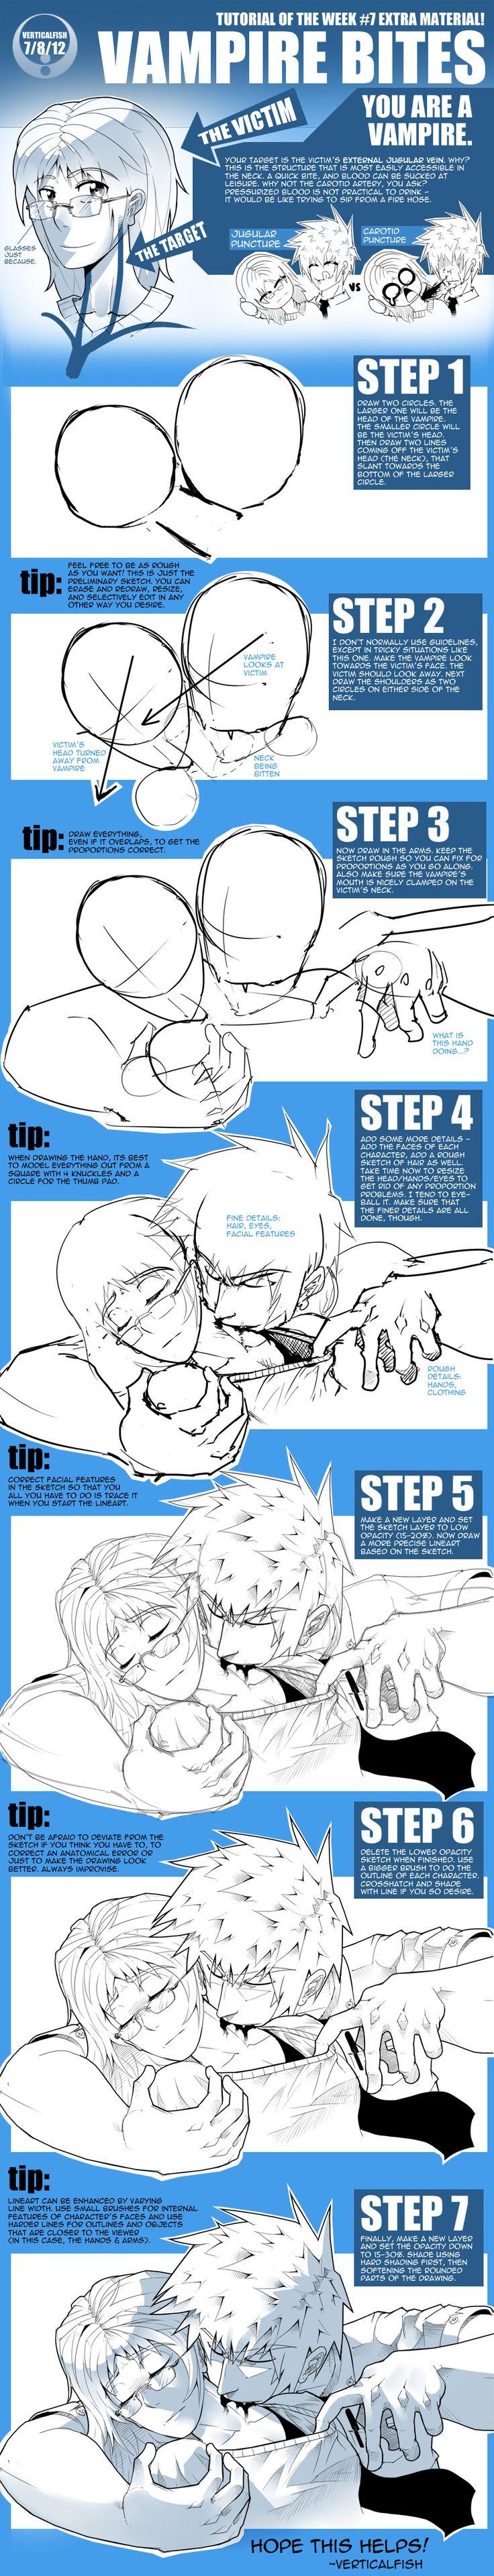 TOW-7+ How to Draw Vampire Bites by verticalfish.deviantart.com on @deviantART